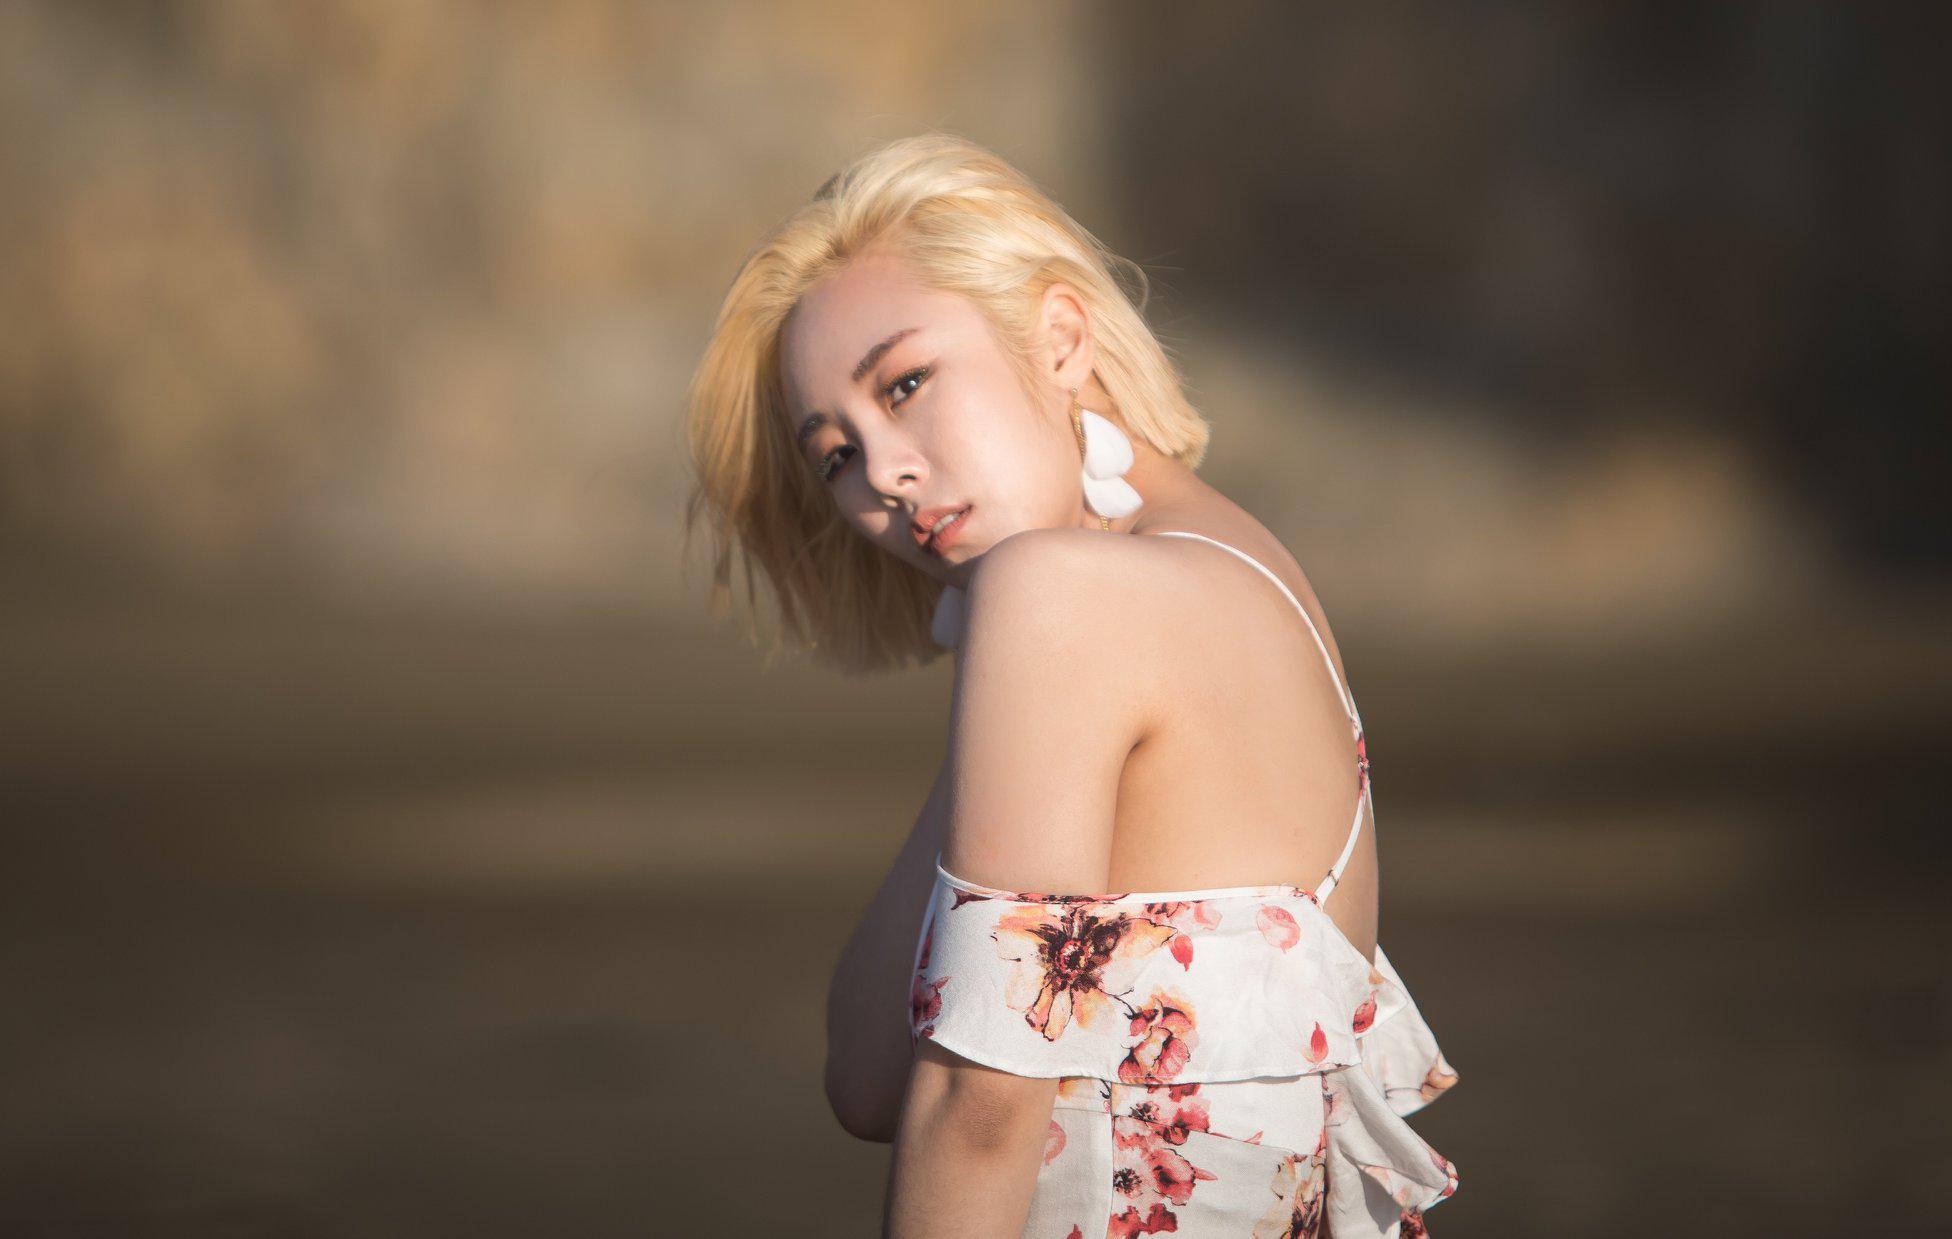 Image Mamamoo Yellow Flower Comeback Teaser 2 Wheeing Kpop